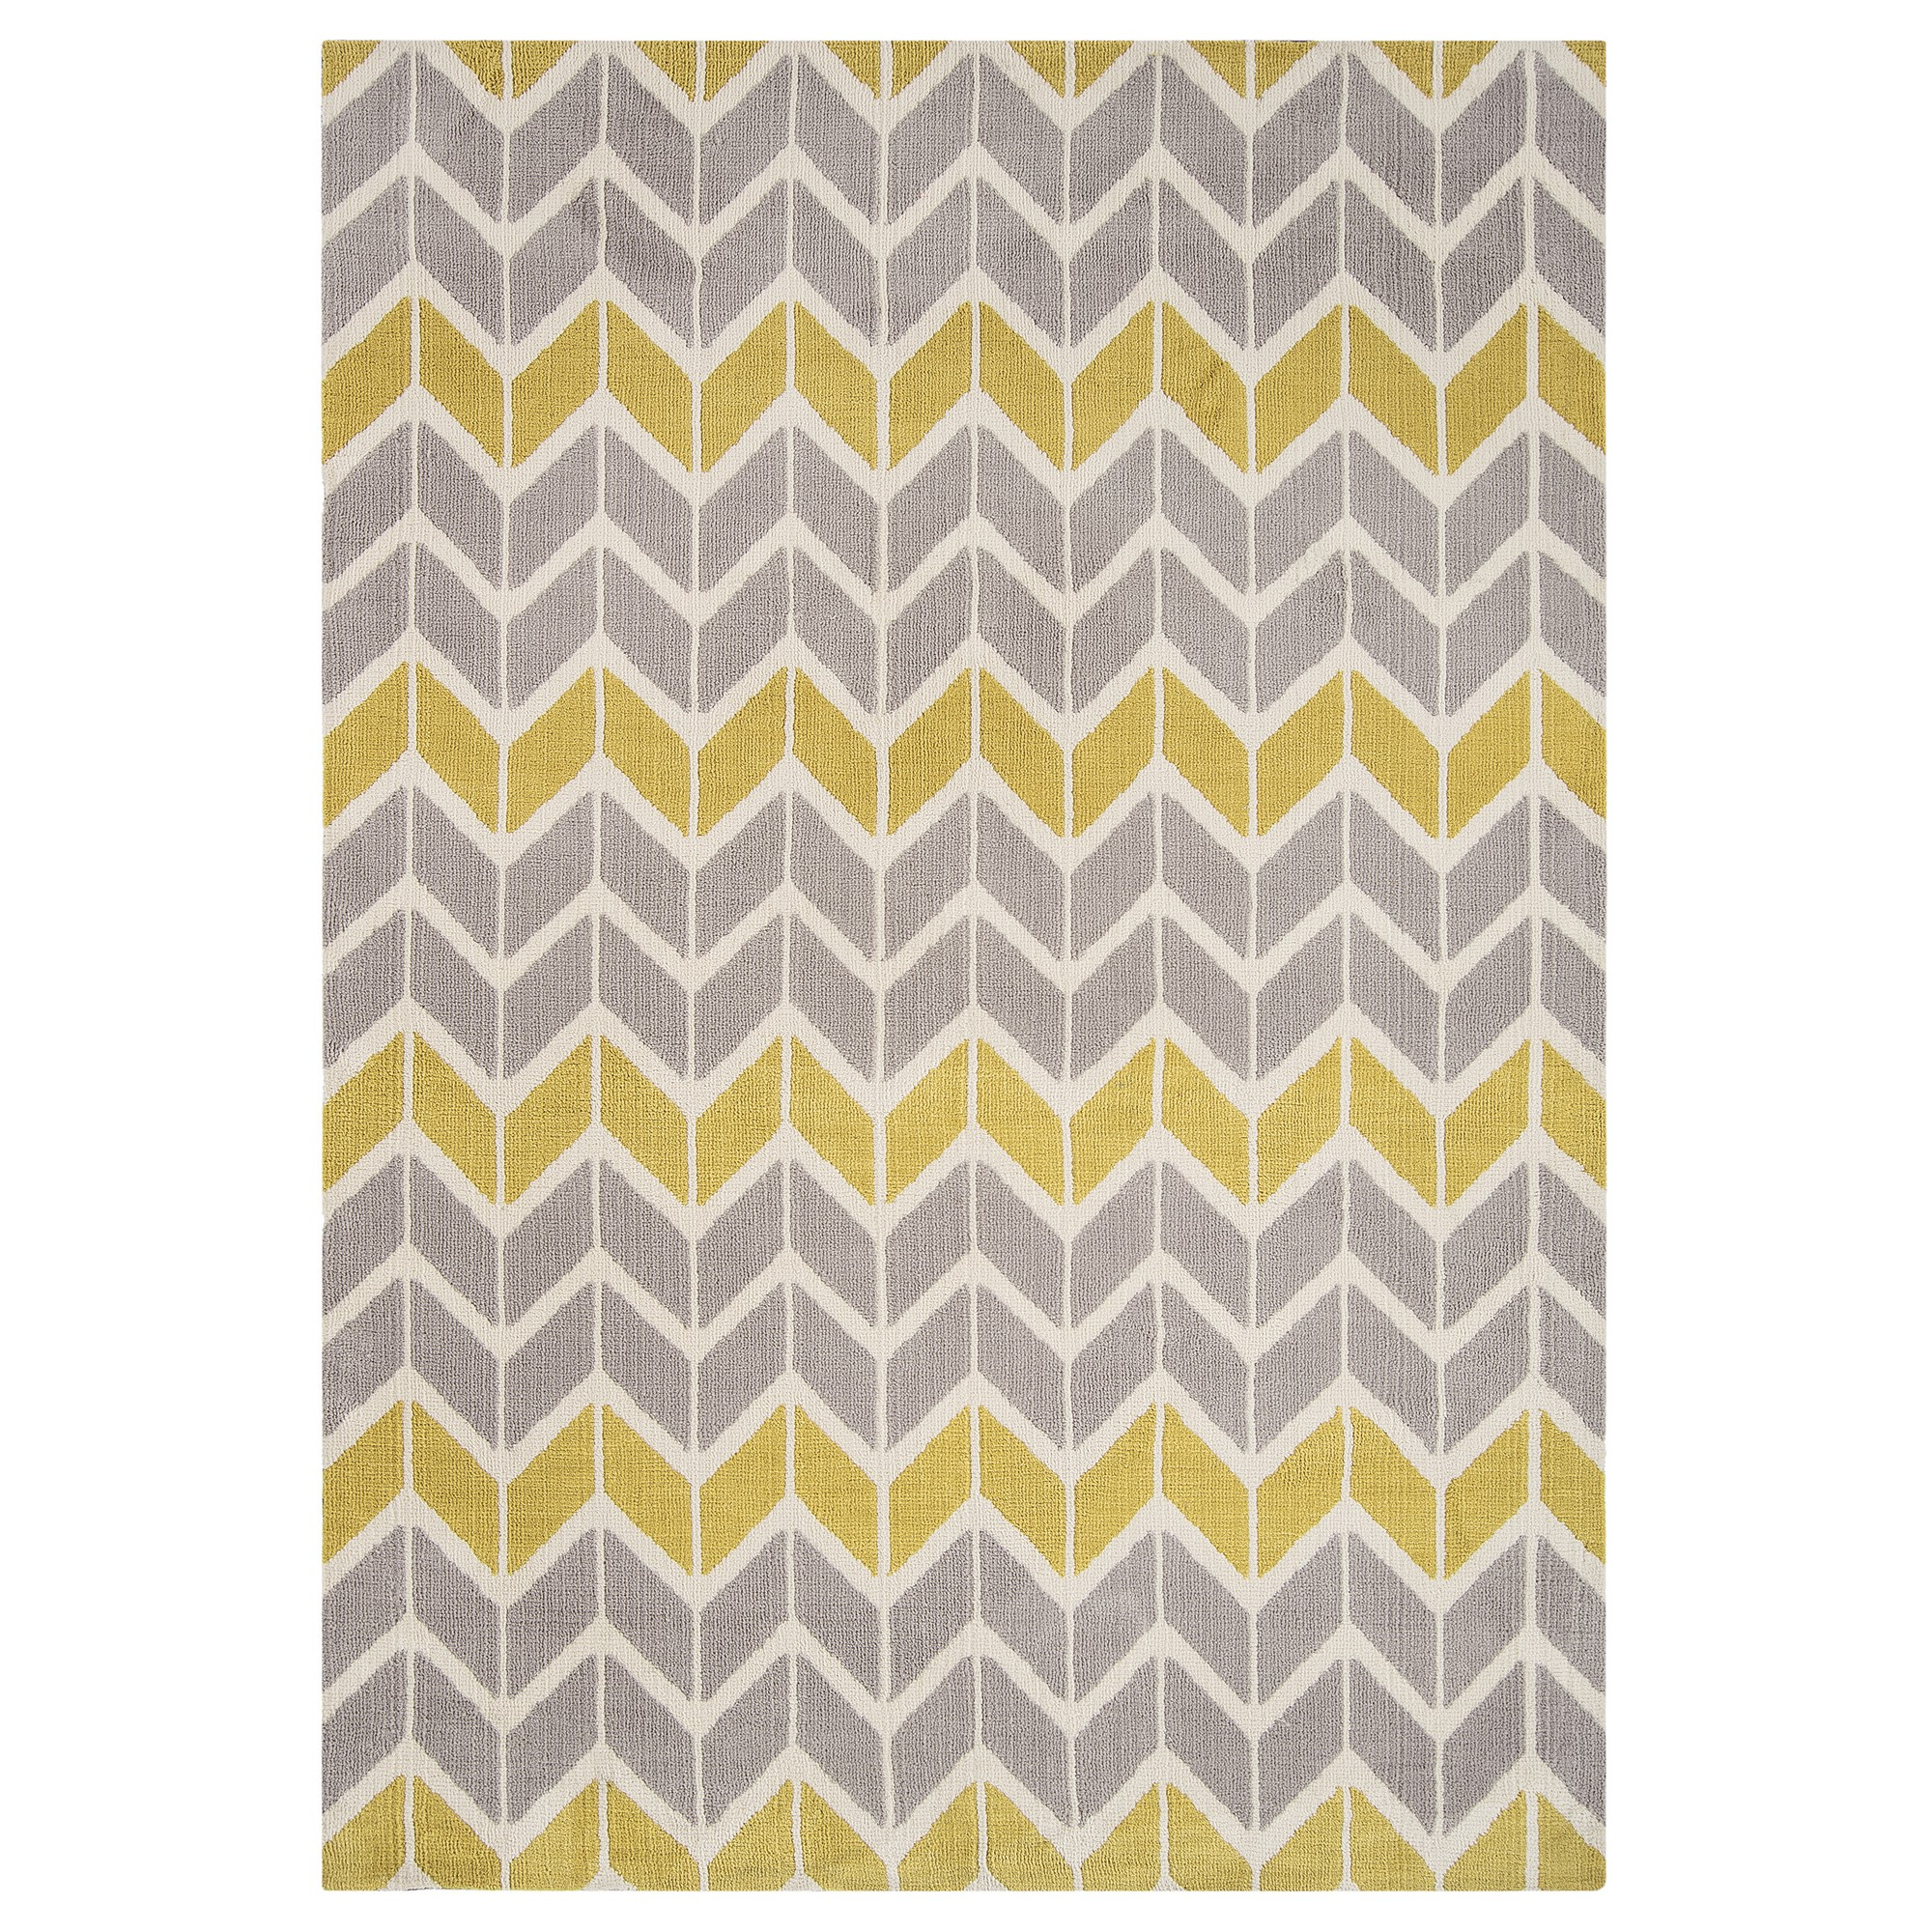 arlo chevron rugs ar in lemon and grey  free uk delivery  the  - arlo chevron rugs ar in lemon and grey